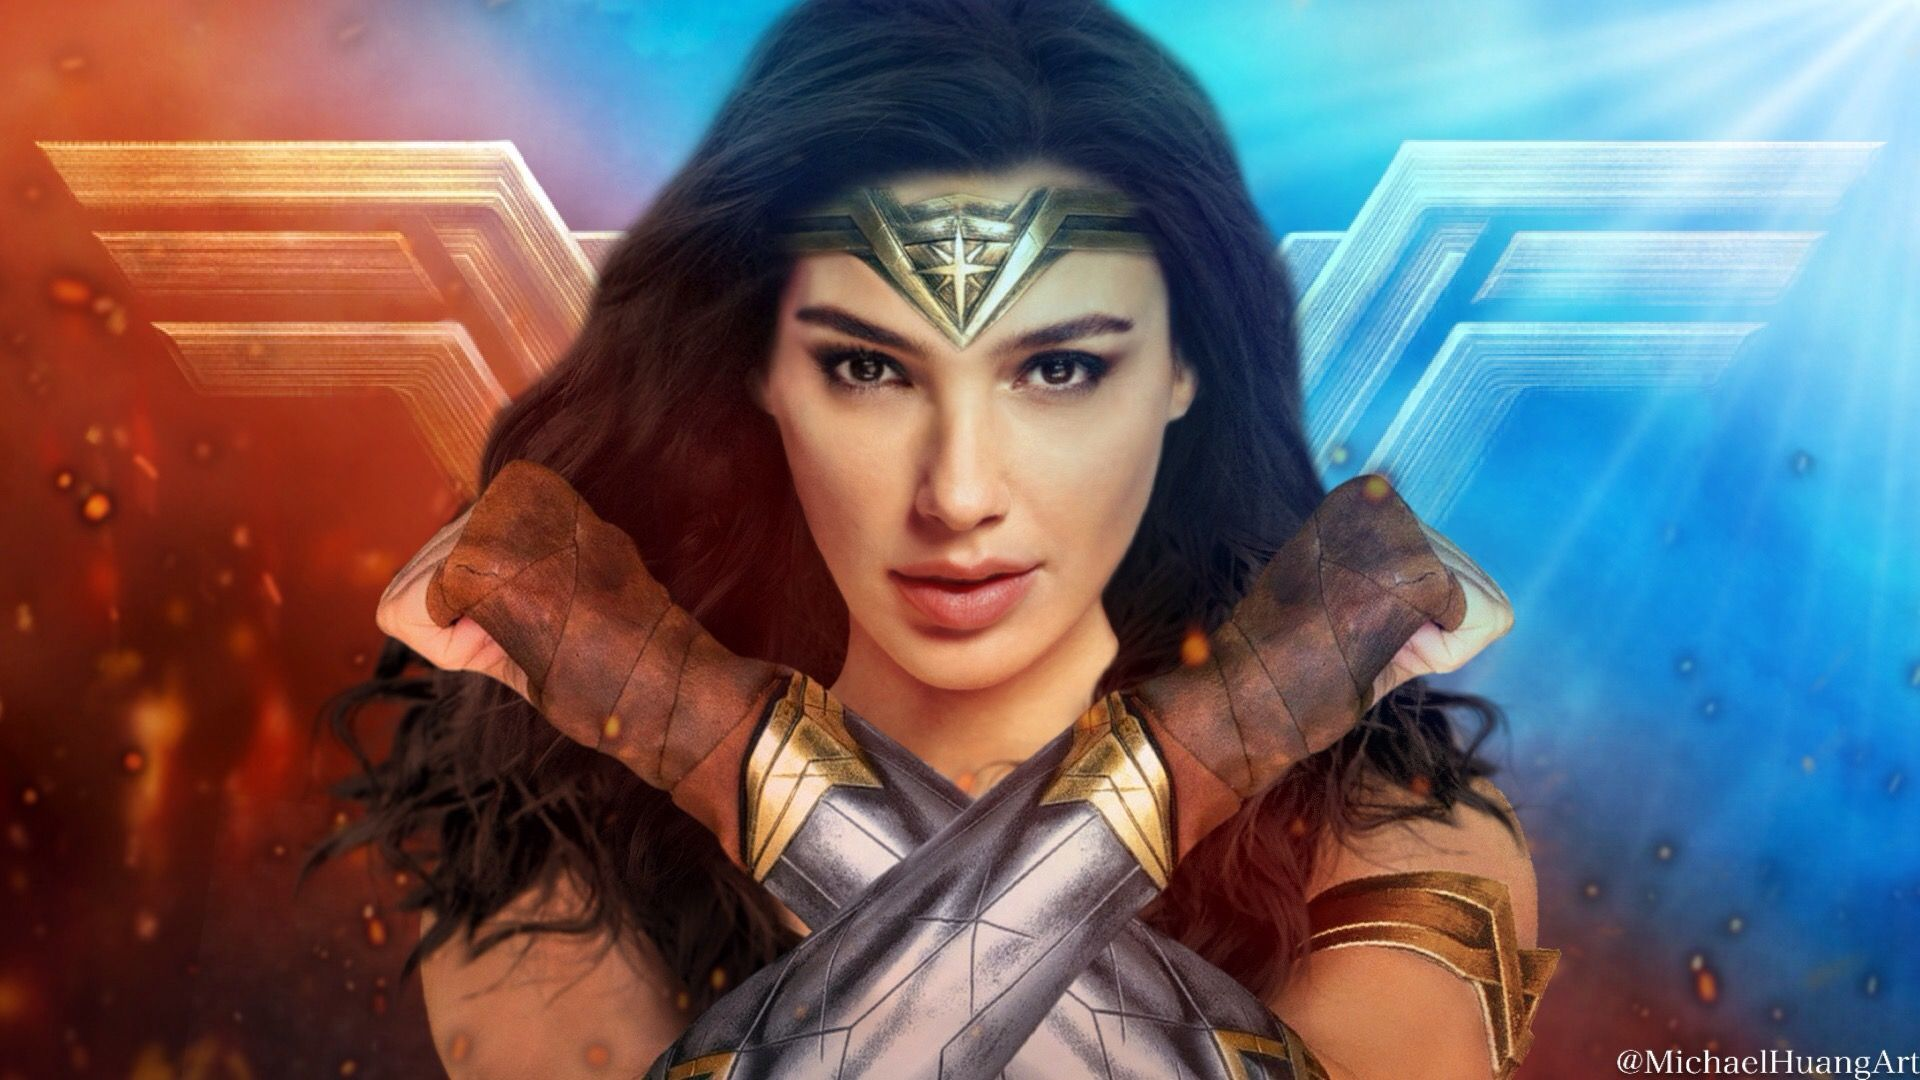 Wonderwoman Wallpaper